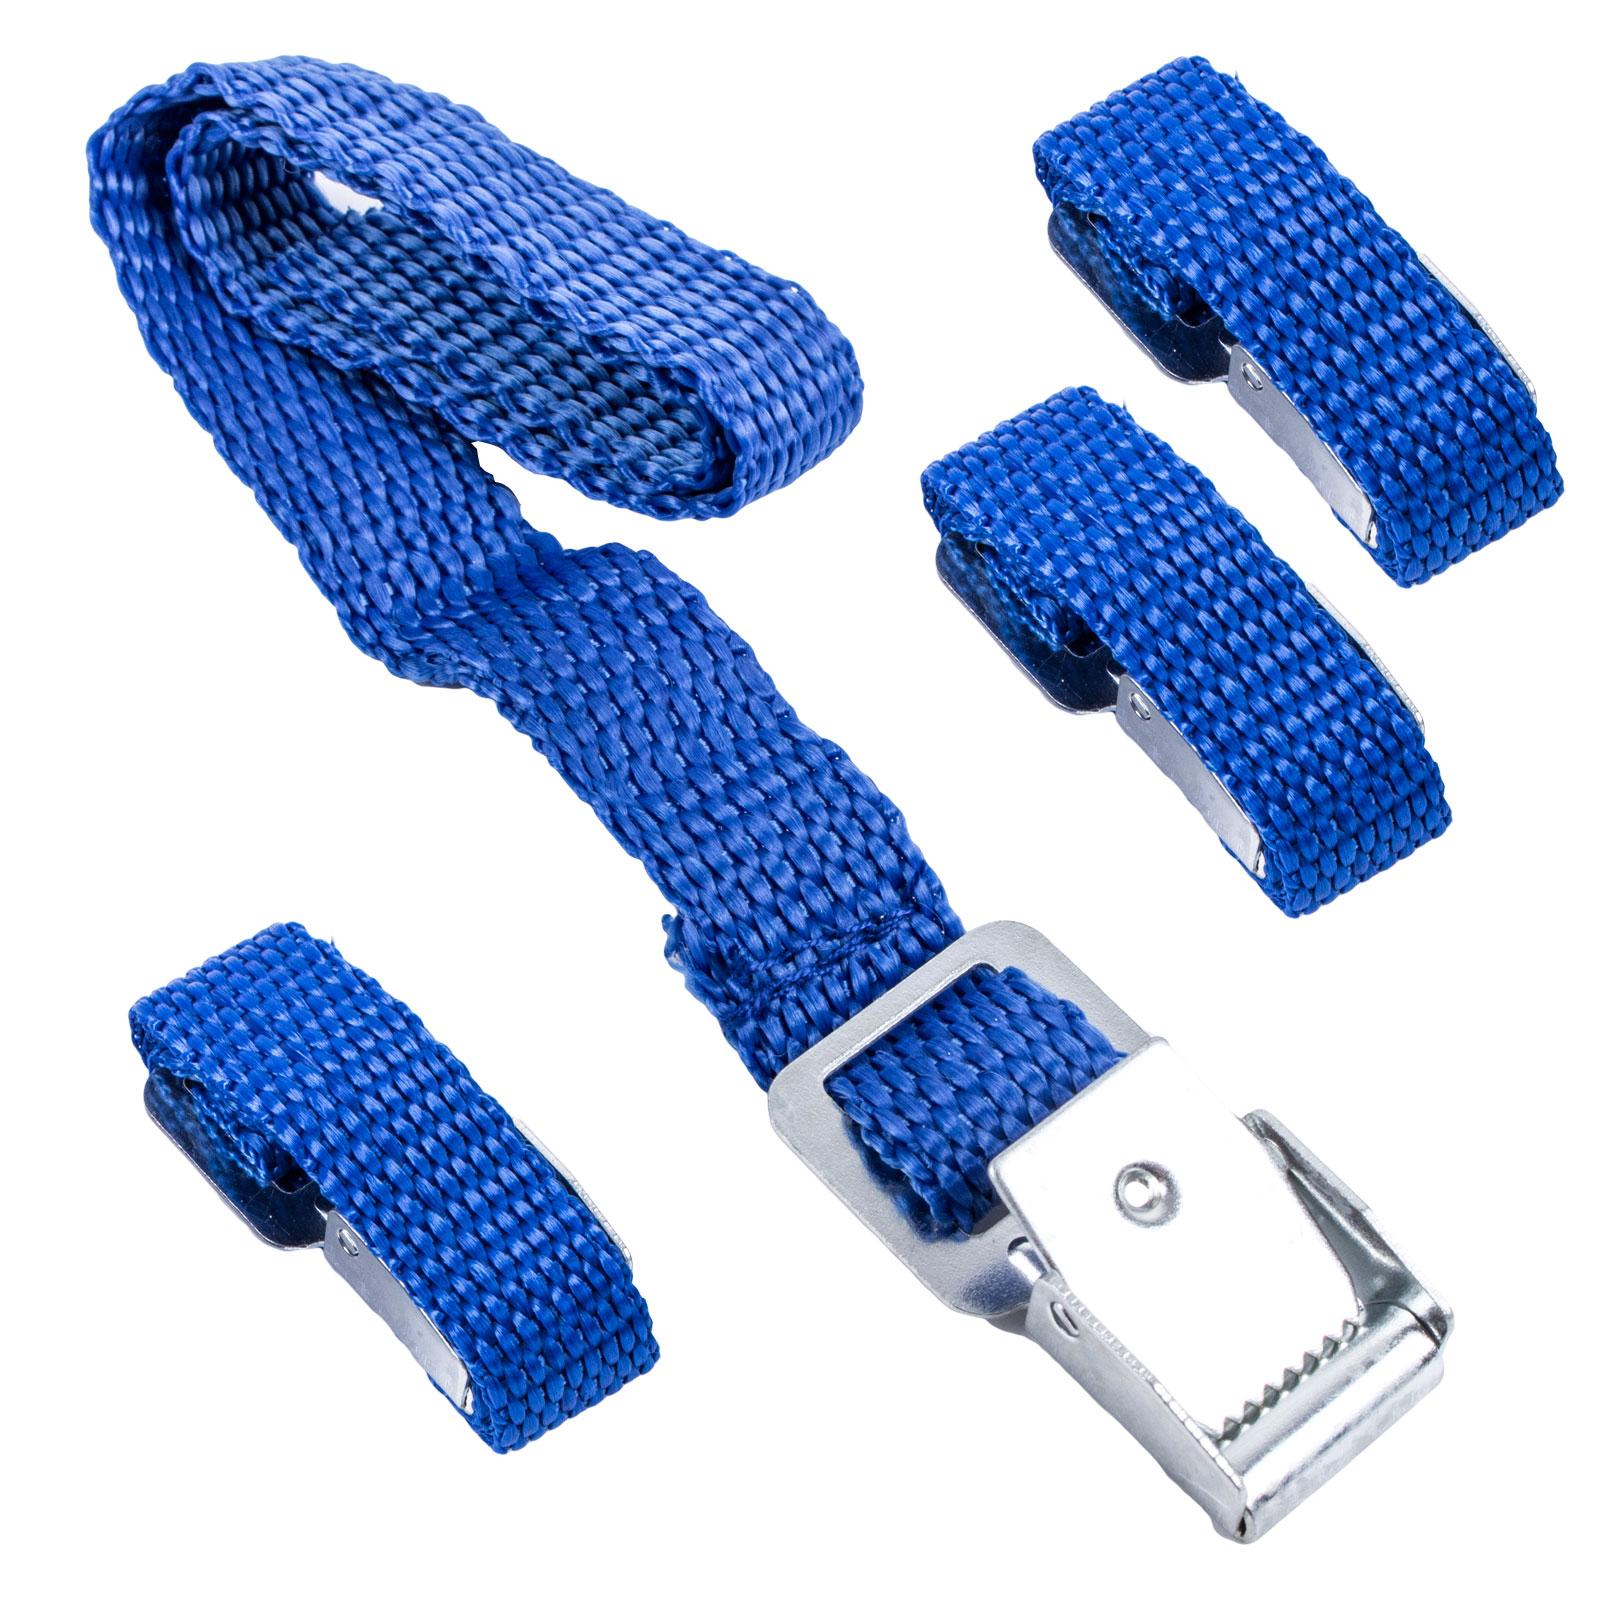 Befestigungsriemen für Fahrradträger blau 4er Set 40 cm Metallschnallen